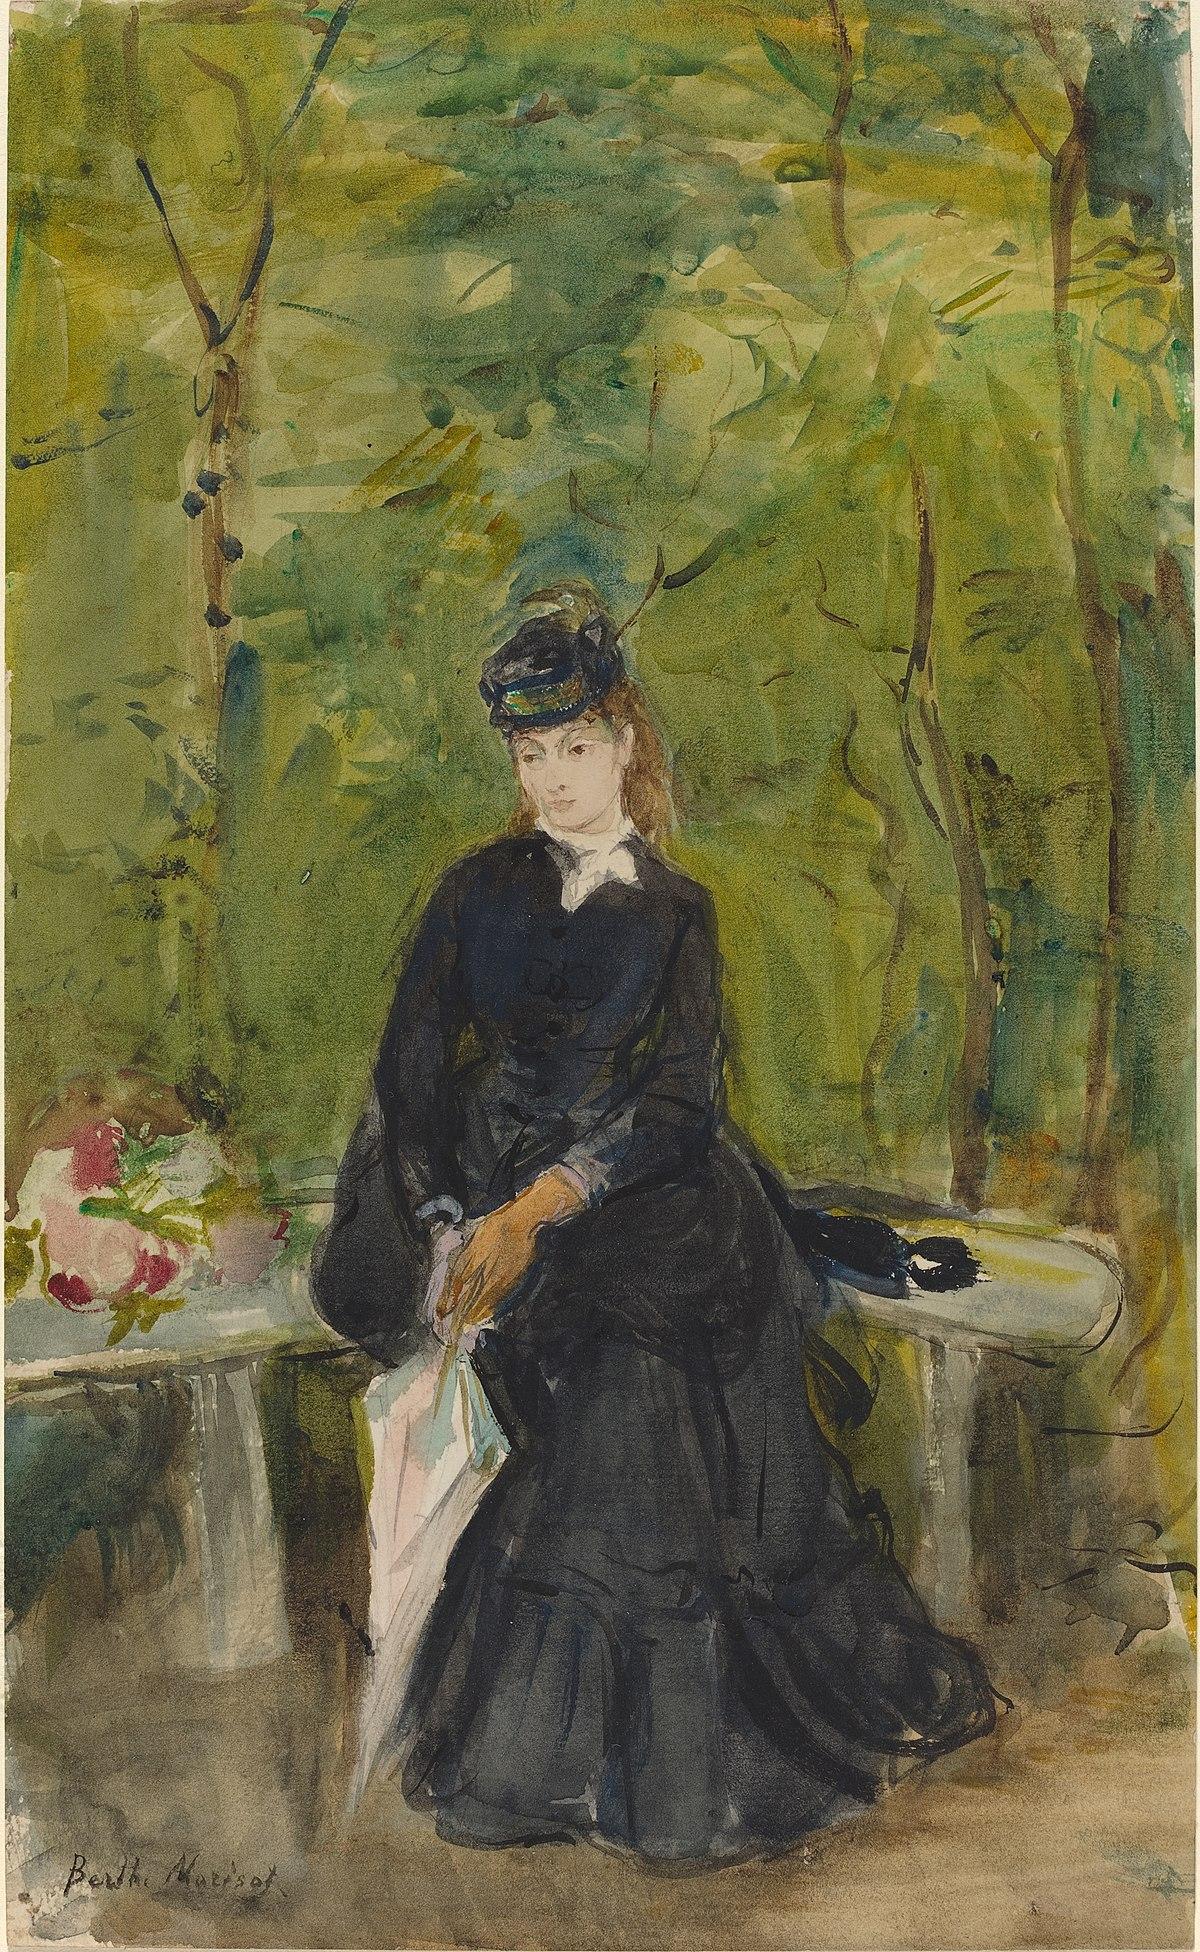 Берта Моризо 3. The Artist's Sister Edma Seated in a Park - Wikidata